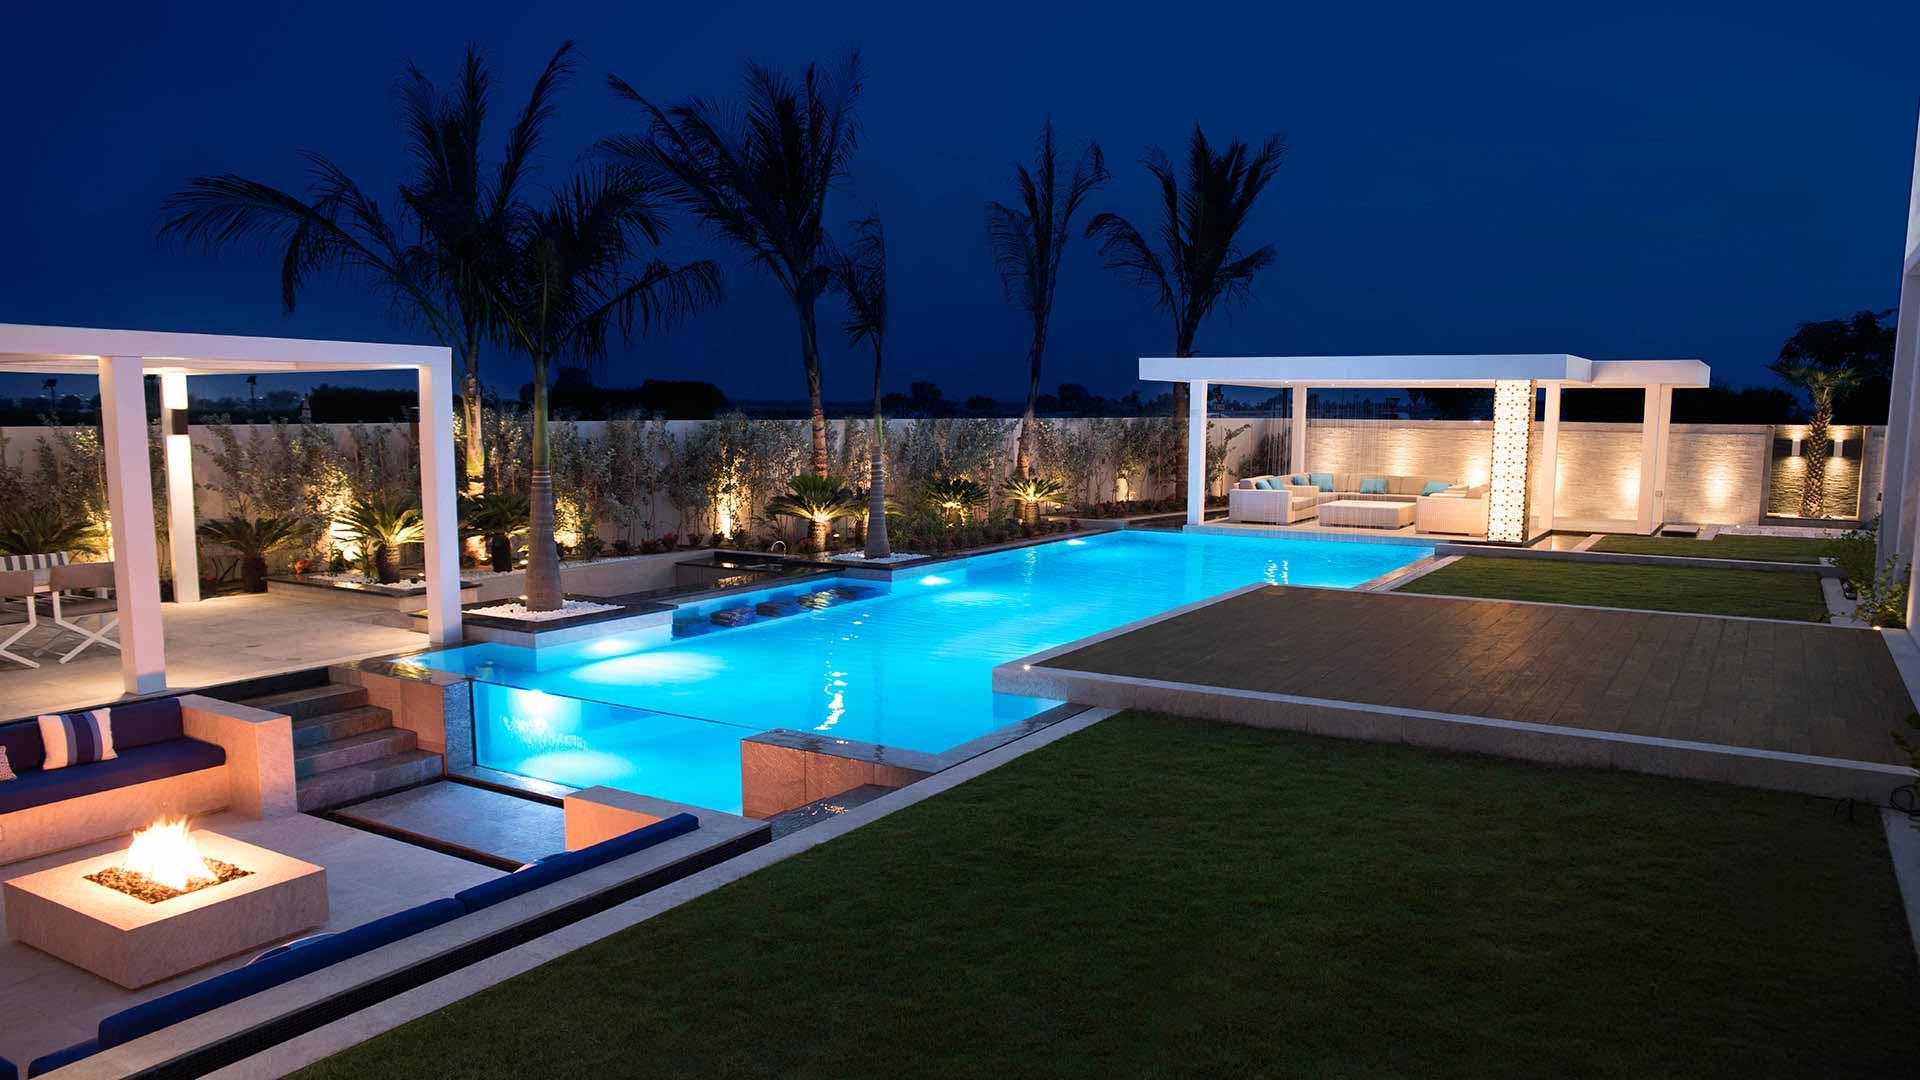 Pool and Landscape Design Company.jpg